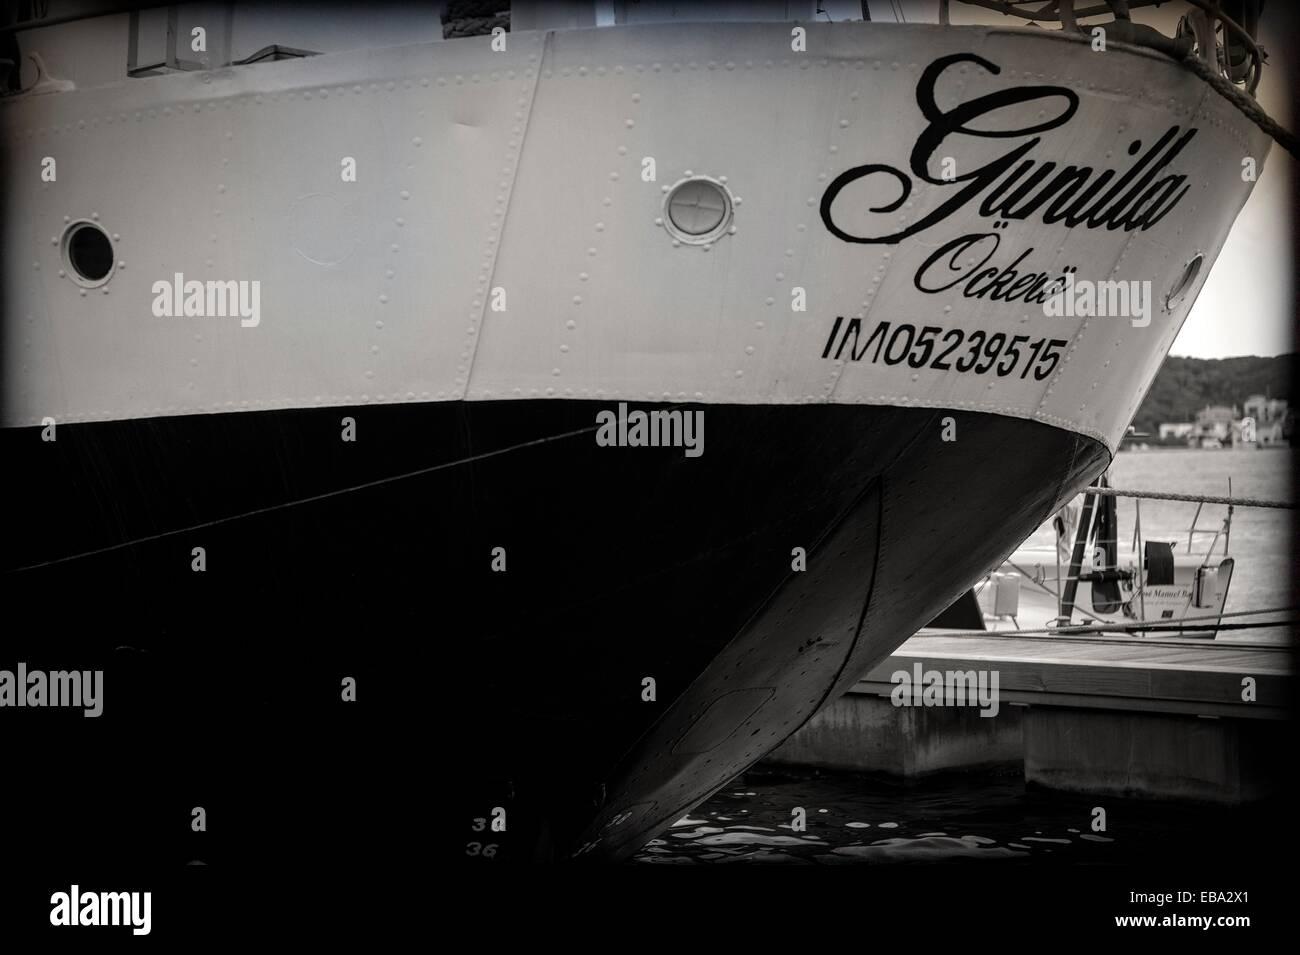 1941 65-70 Abenteuer Antiguo Aventura Bachillerato hinter schwarzen und weißen Boot Casco Clasico klassische Konzept Detras educacion Stockfoto